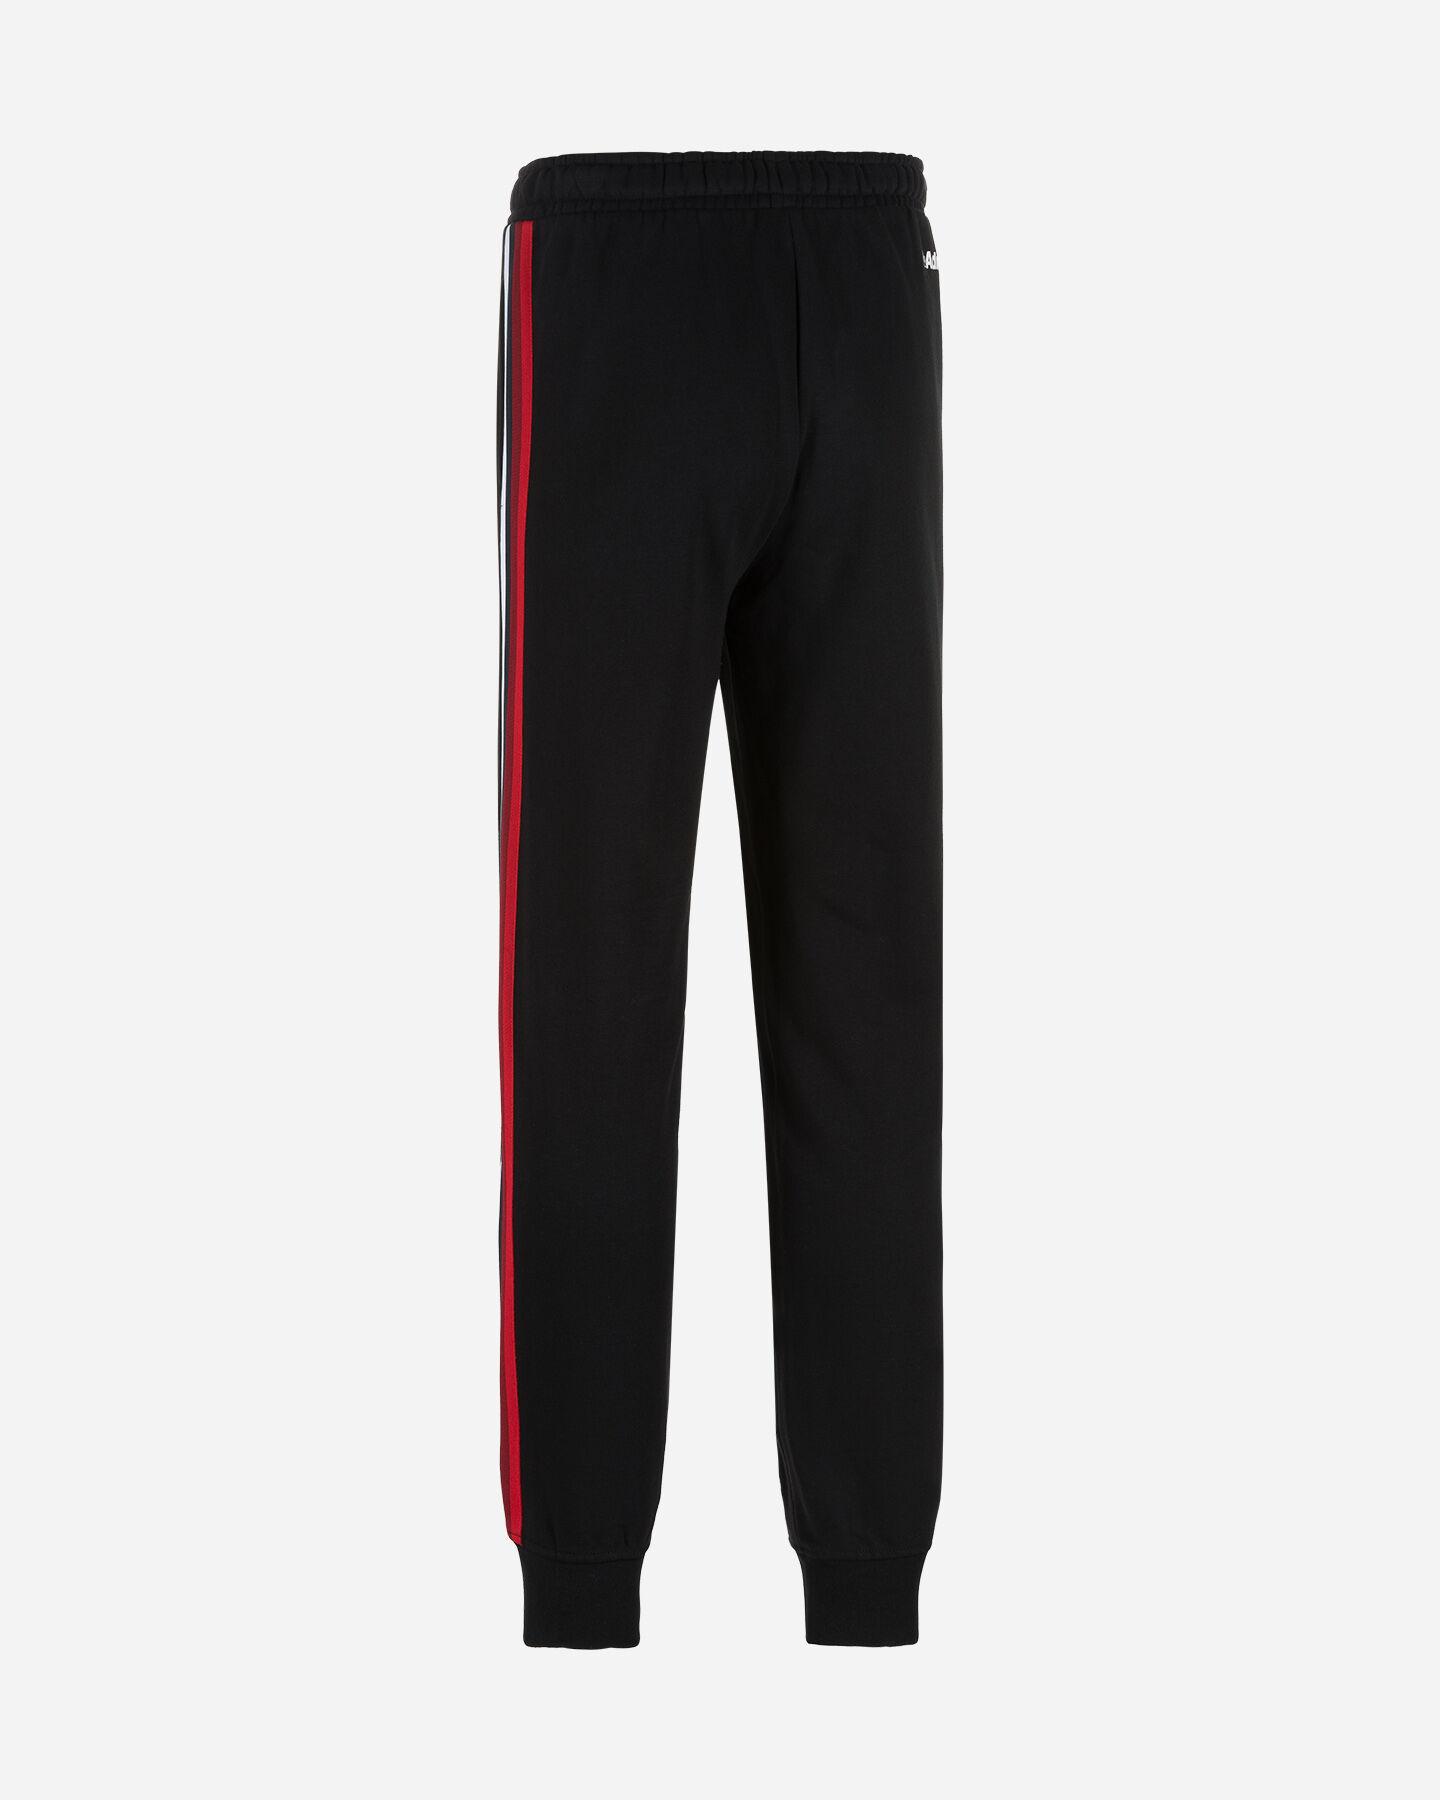 Pantalone ADMIRAL BASIC UK M S4067305 scatto 1